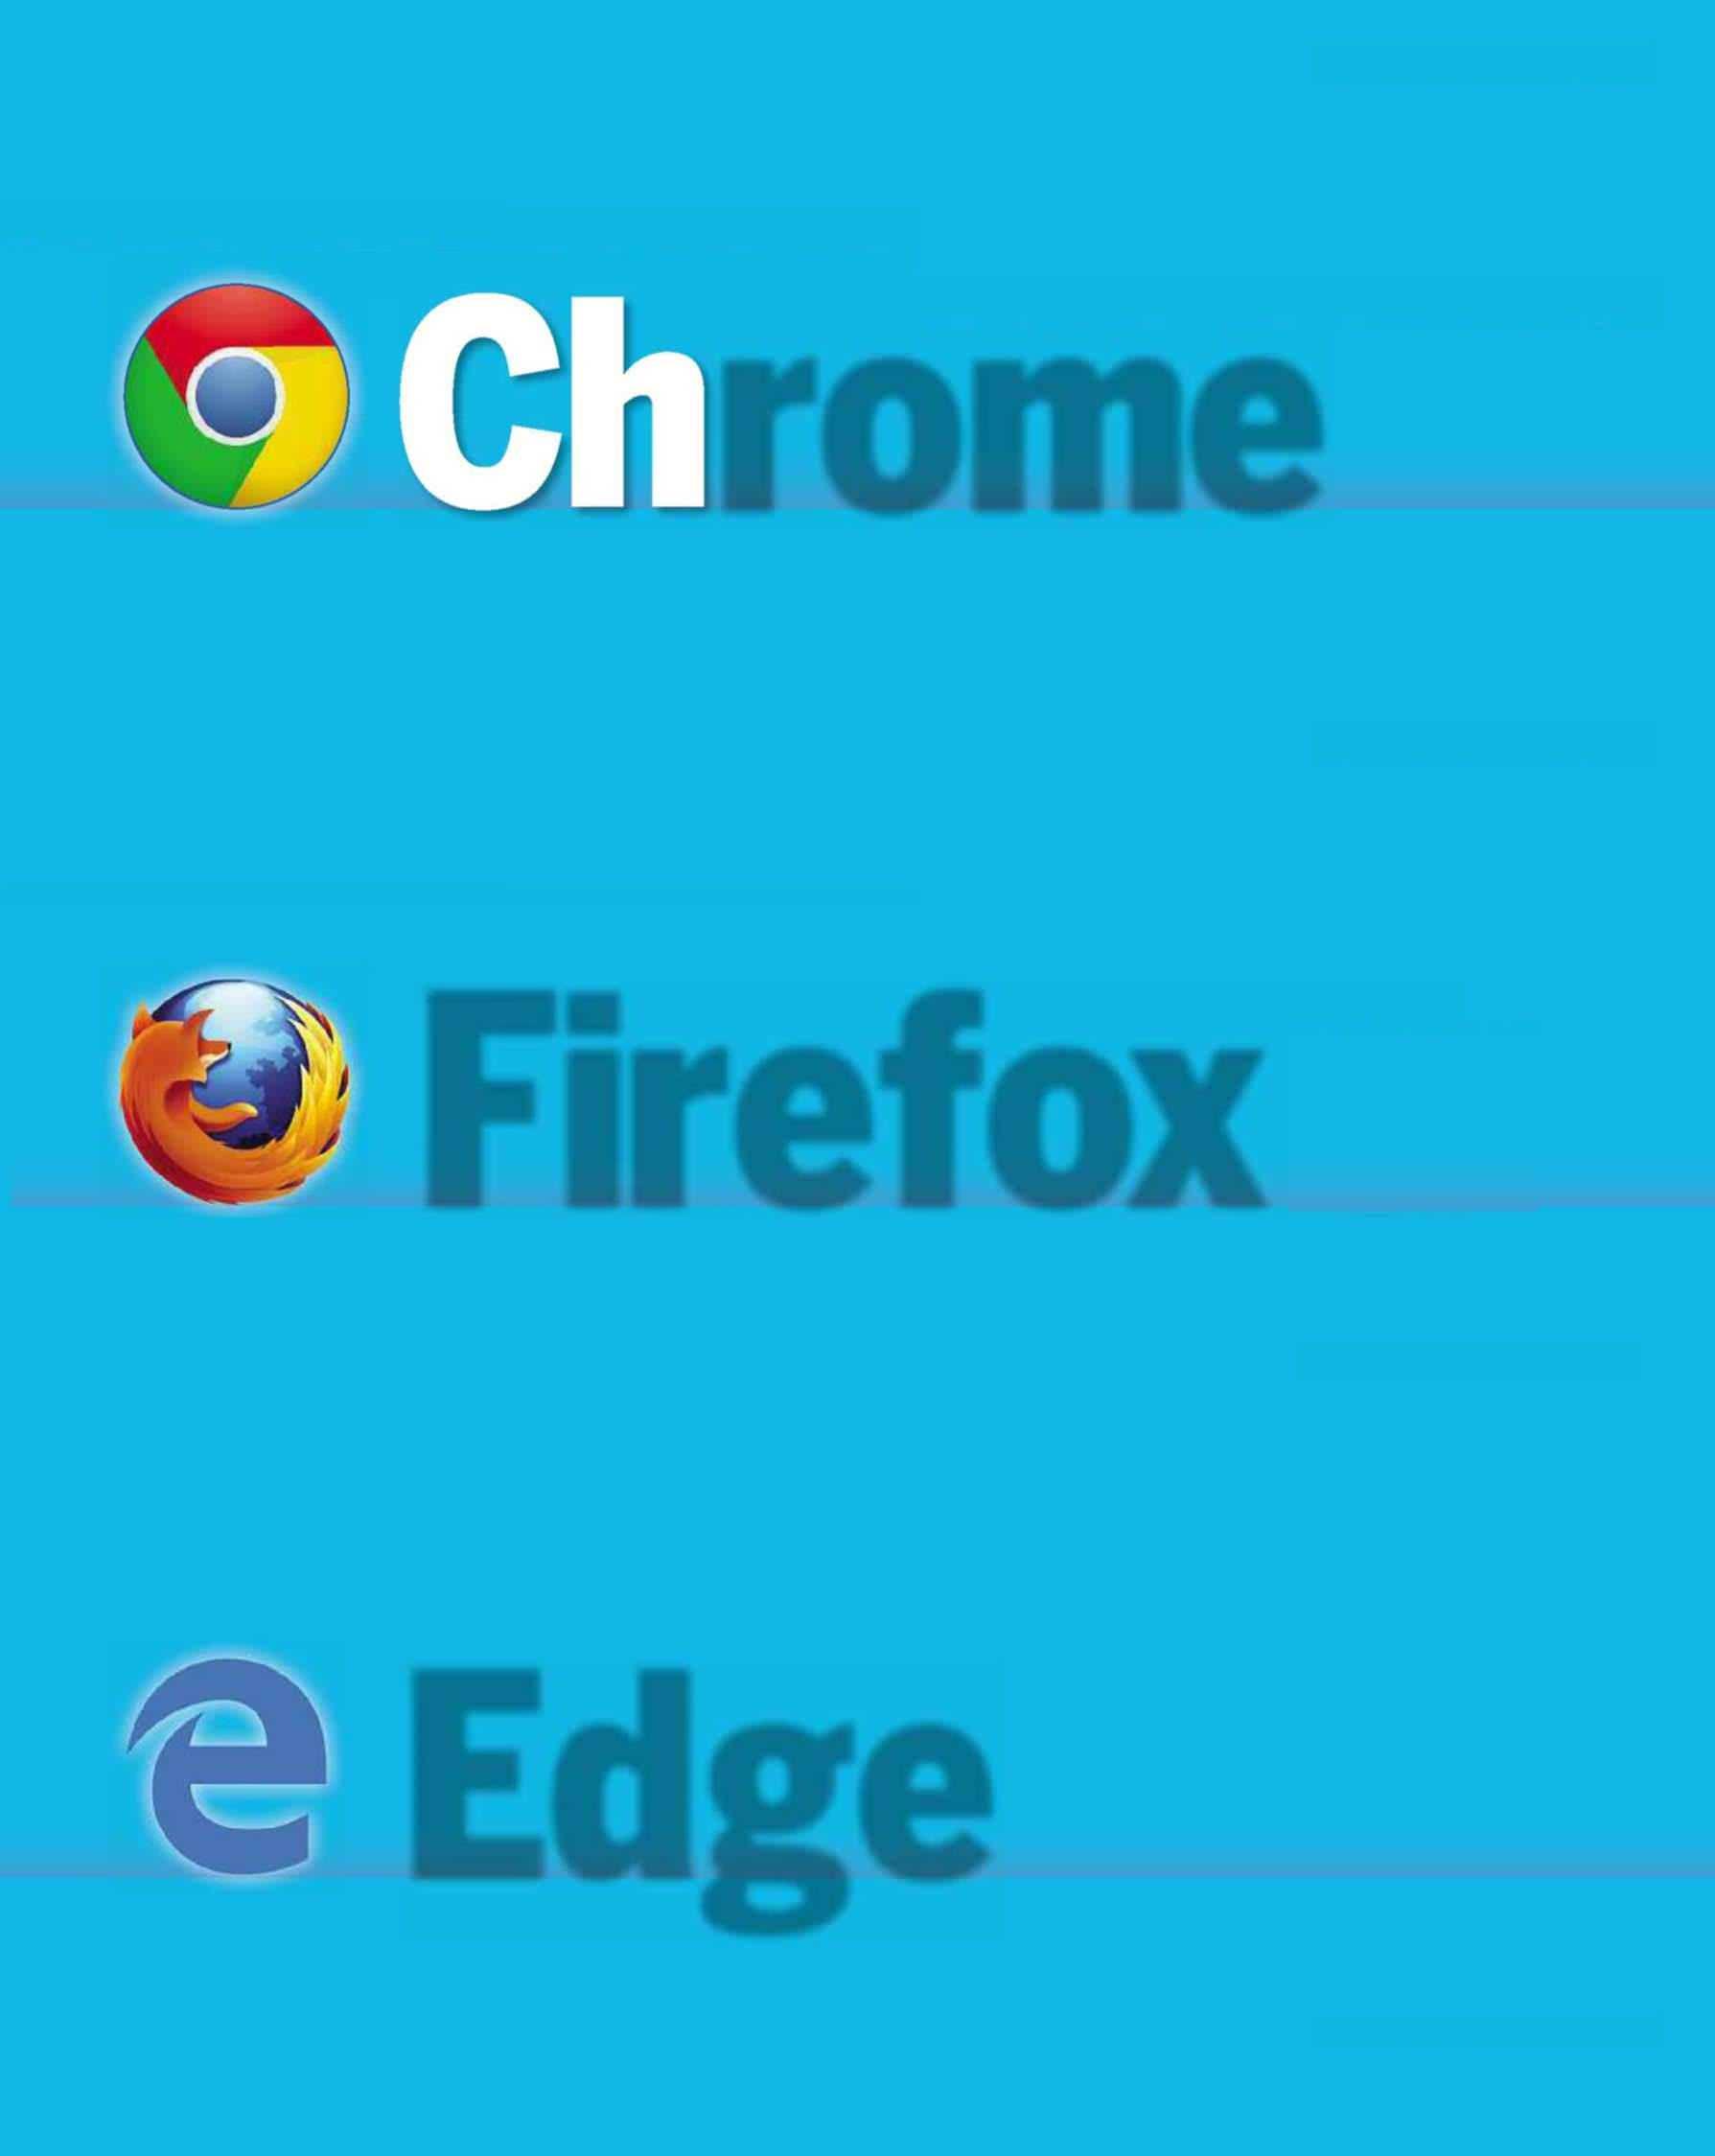 Hack & Improve - Chrome, Firefox & Edge